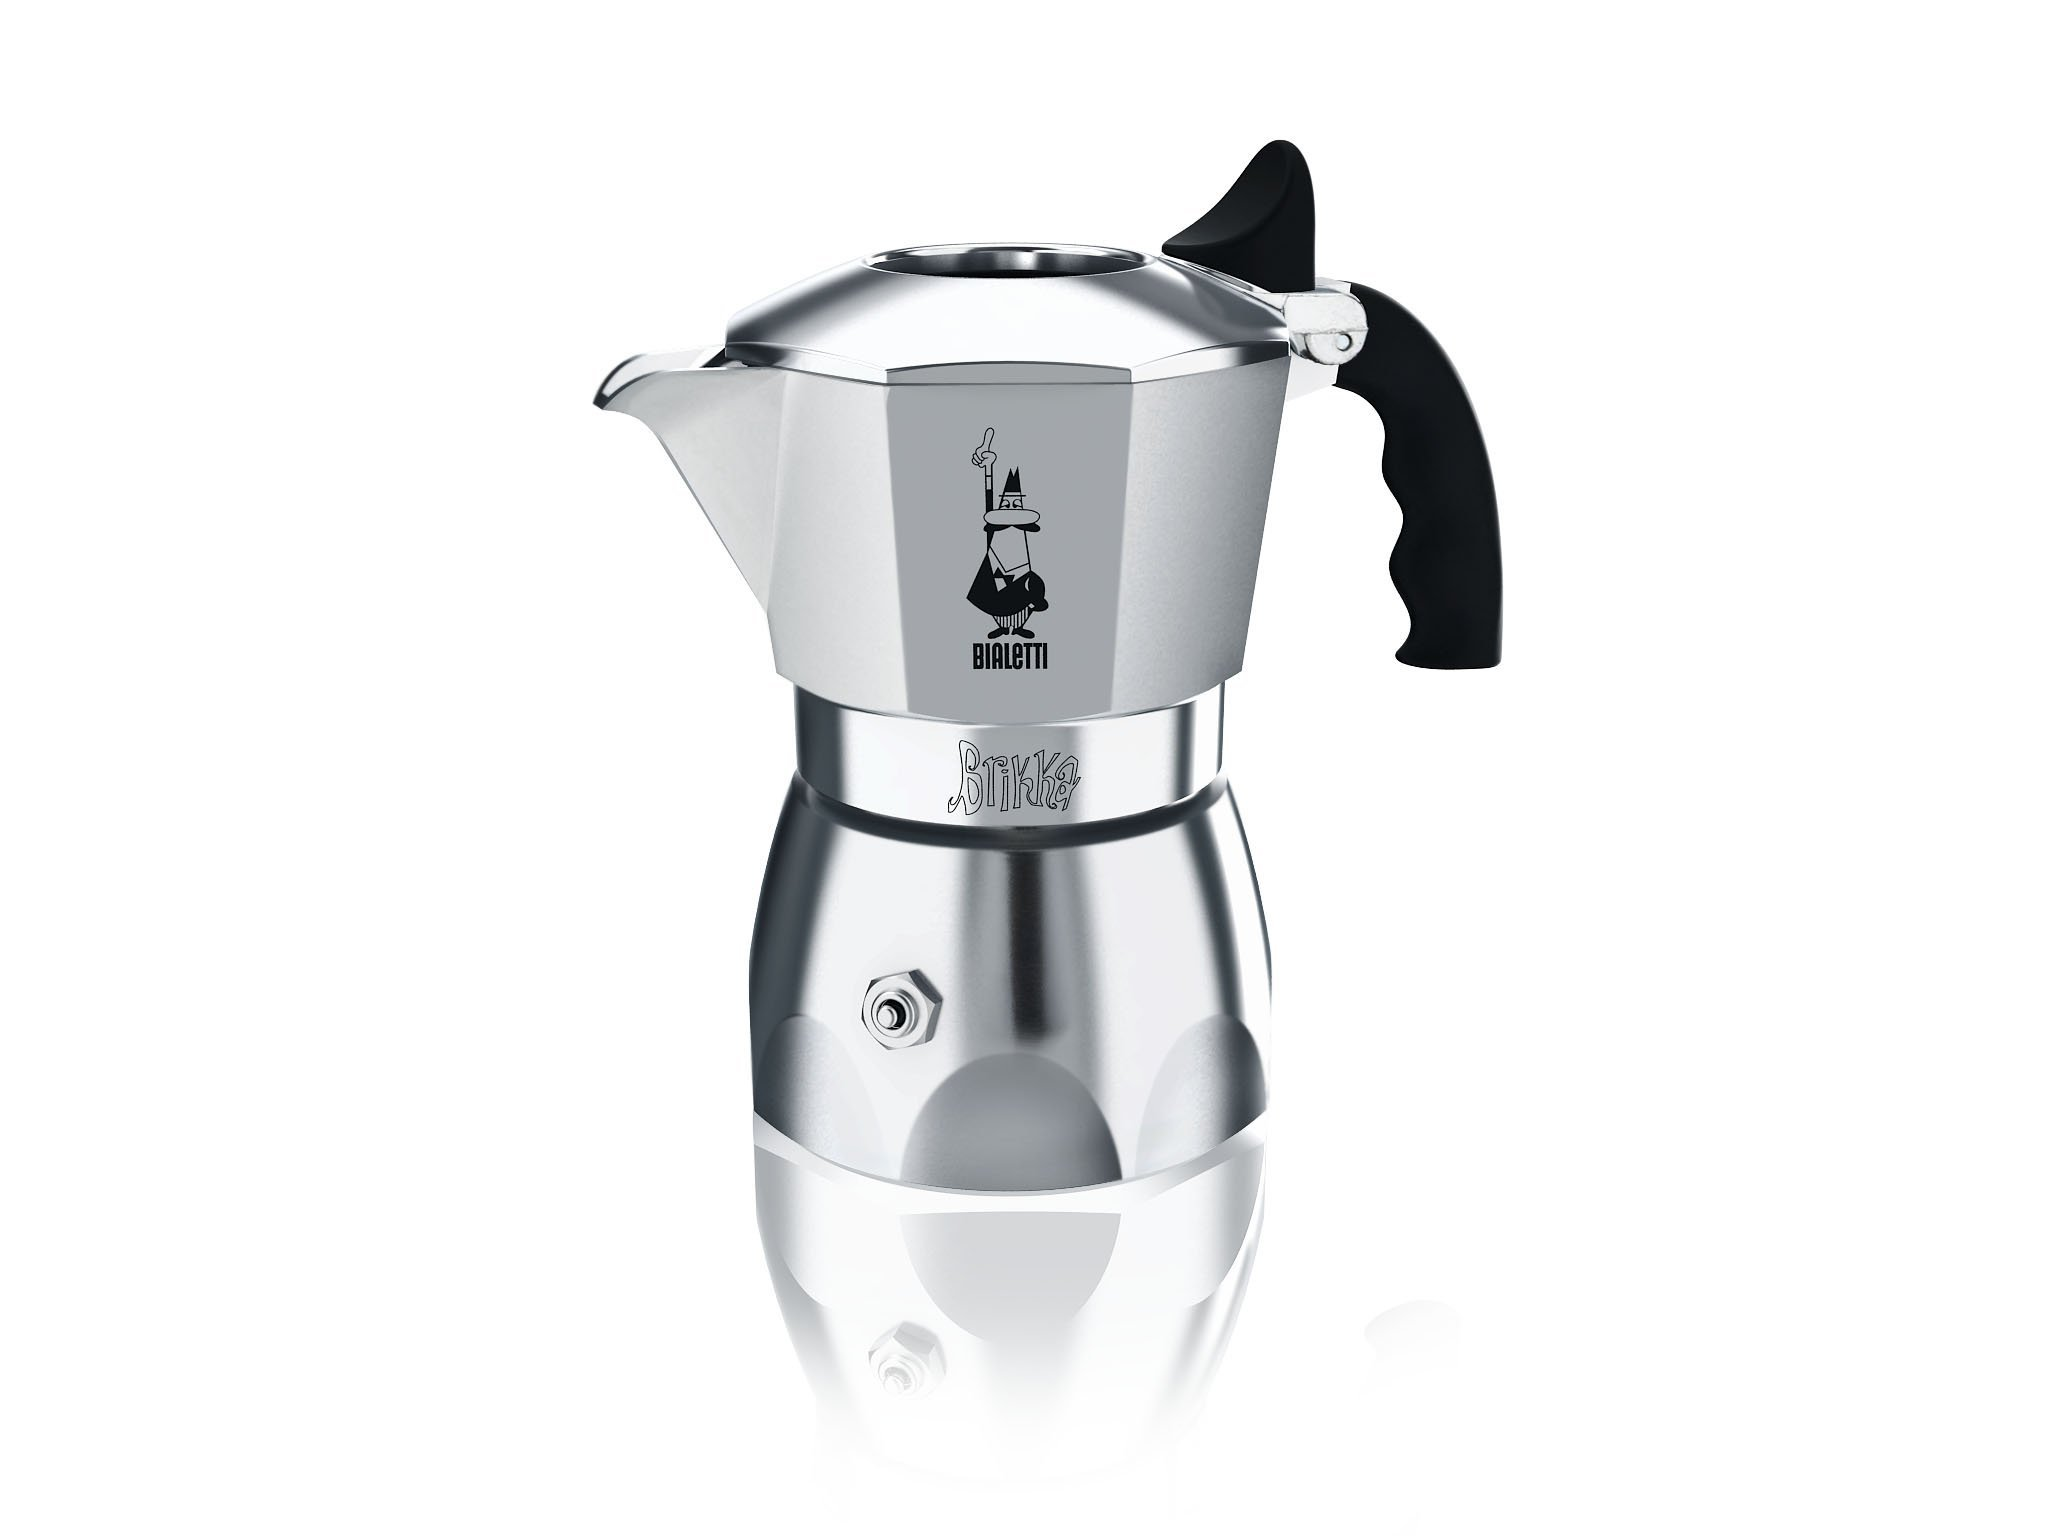 Bialetti ''Brikka'' Stove Top Espresso Maker, 2-cup (3 Oz) by Bialetti (Image #1)